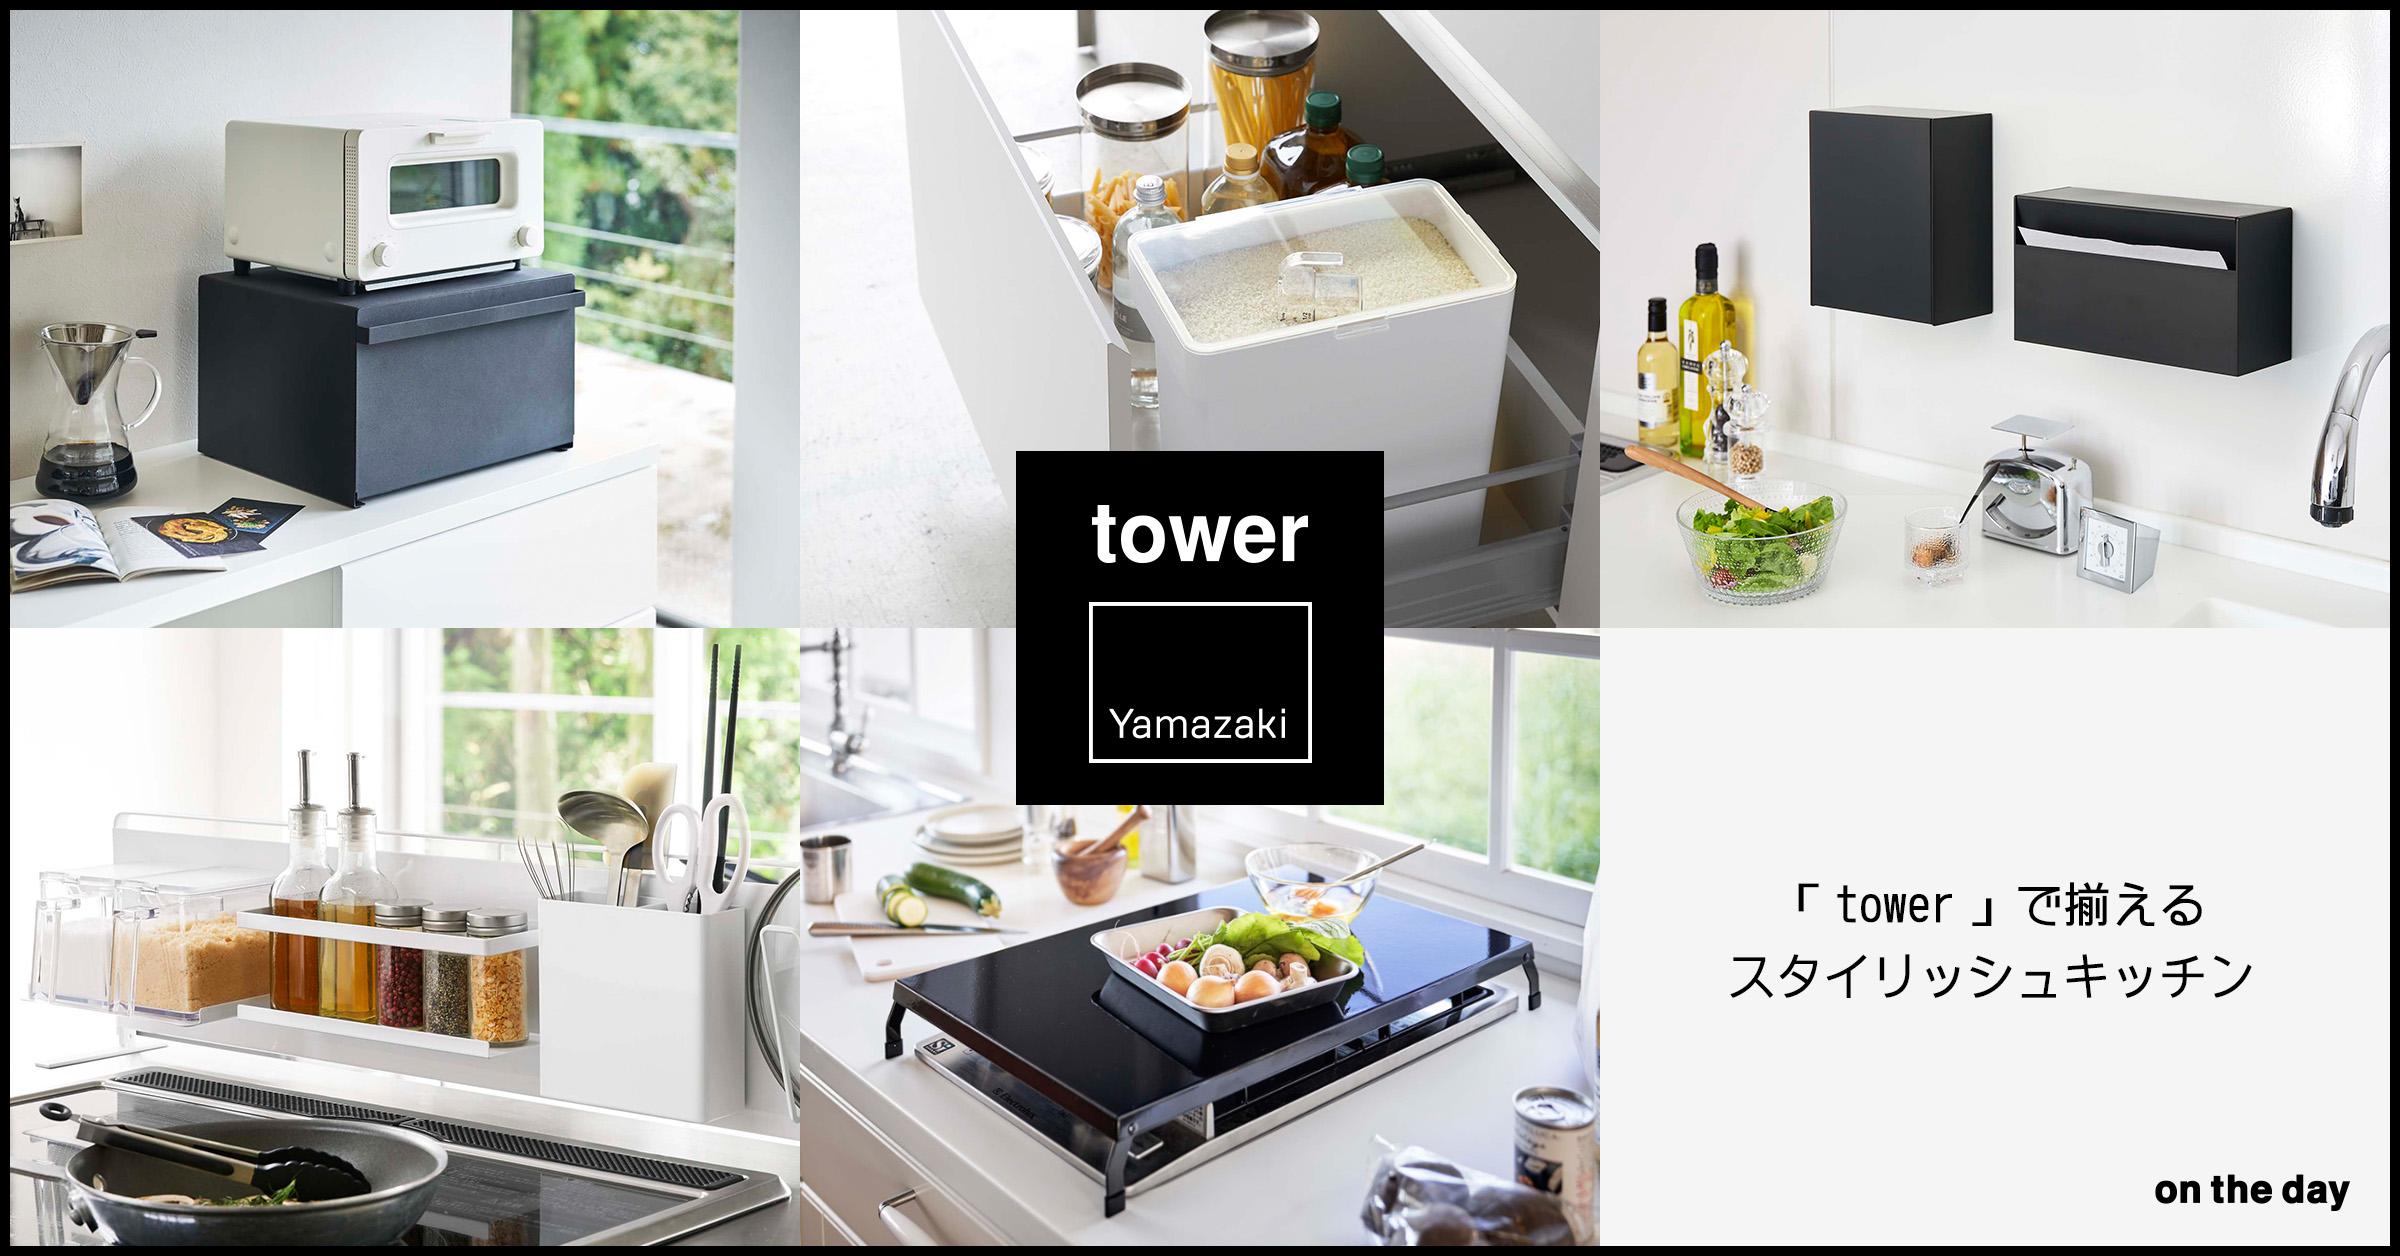 【tower/タワー】で揃えるスタイリッシュキッチン